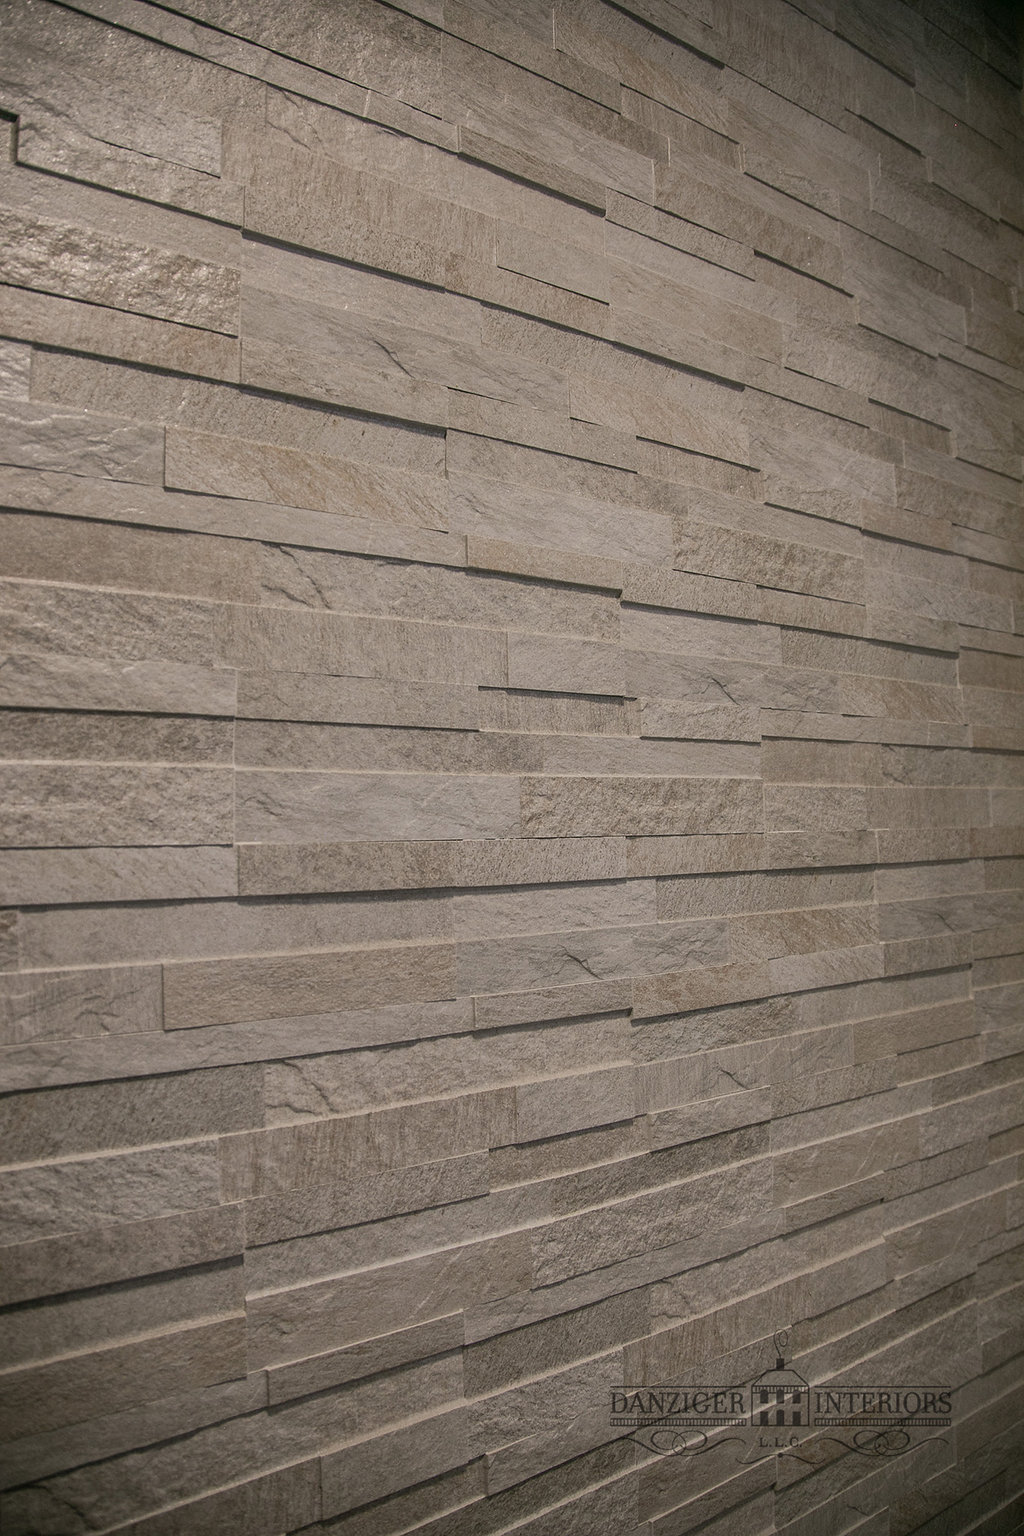 Tile ledger wall to mount TV